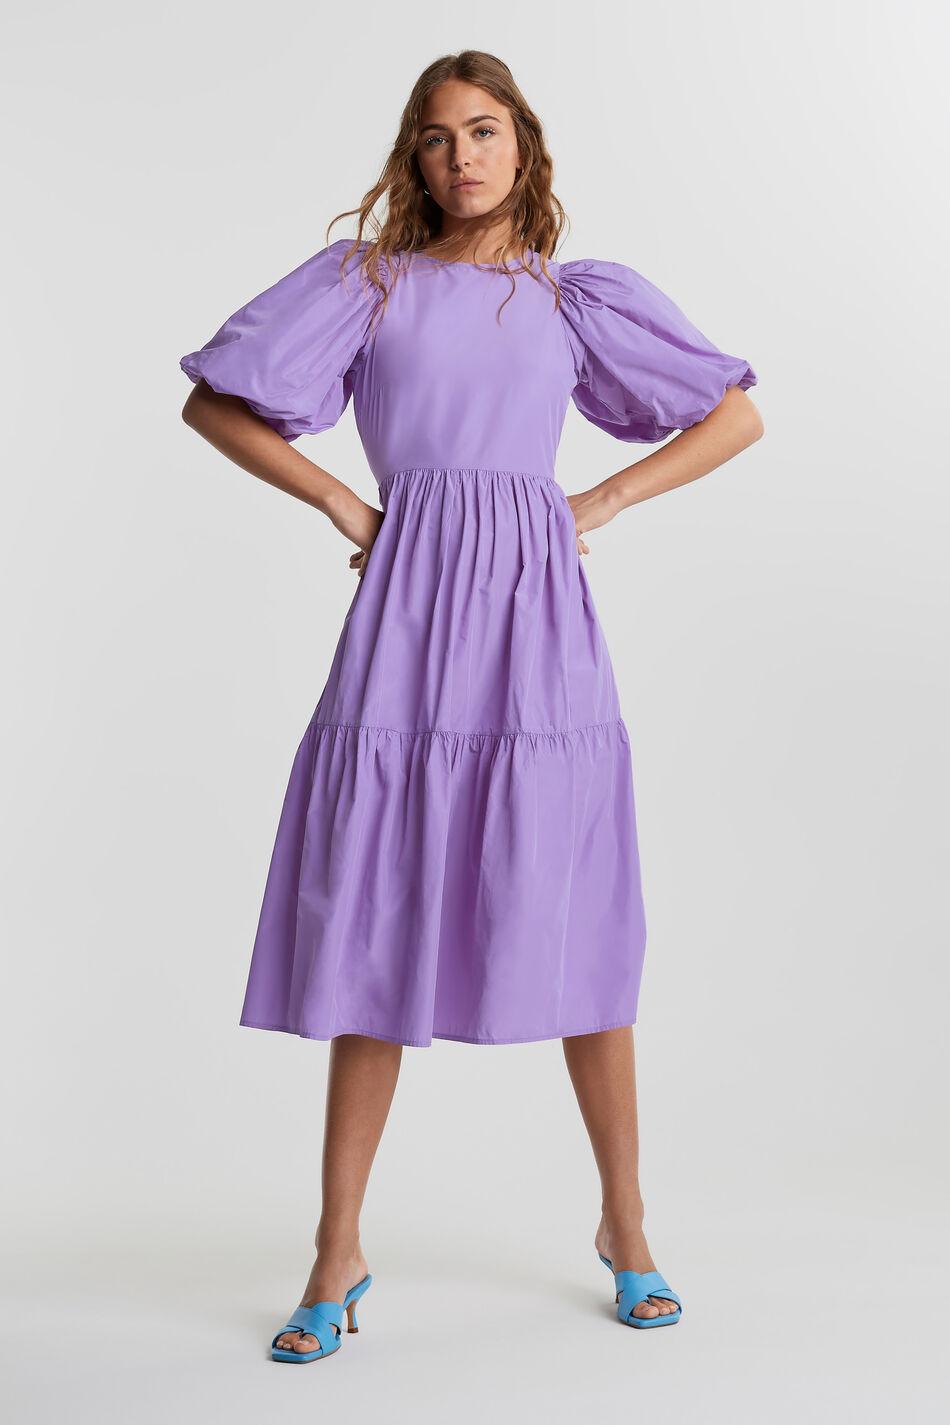 Gina Tricot Myra midi dress